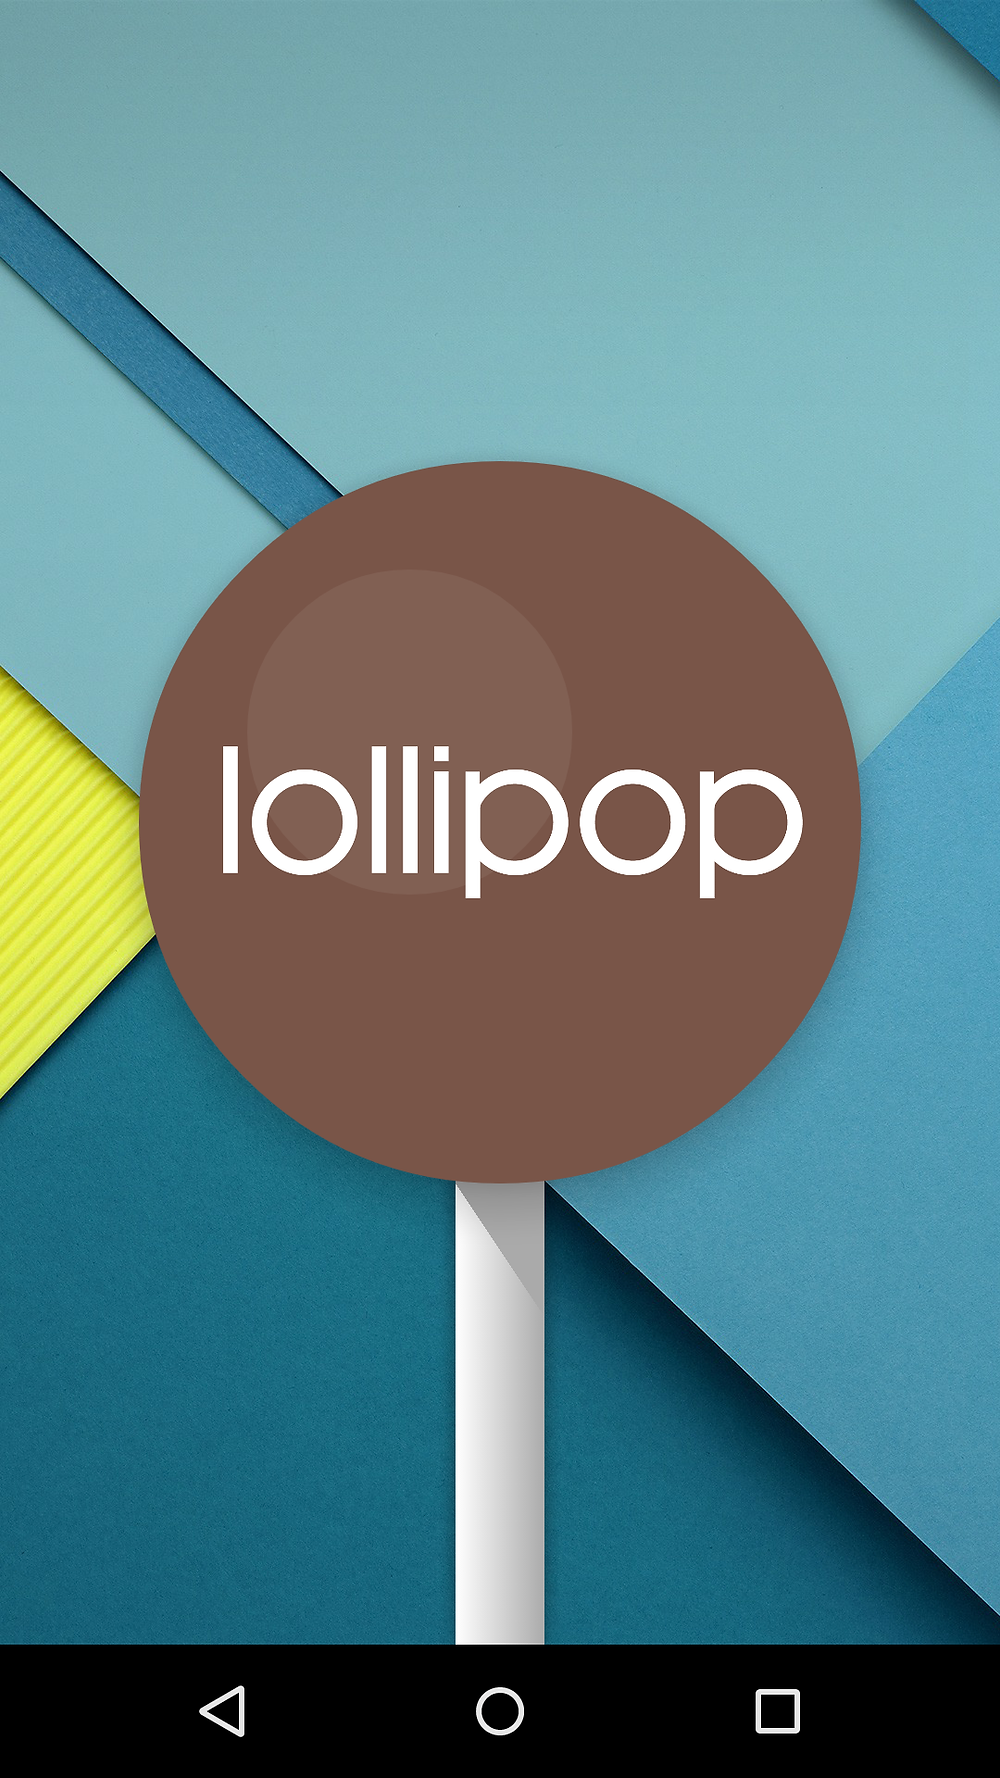 The Lollipop Easter Egg Screen